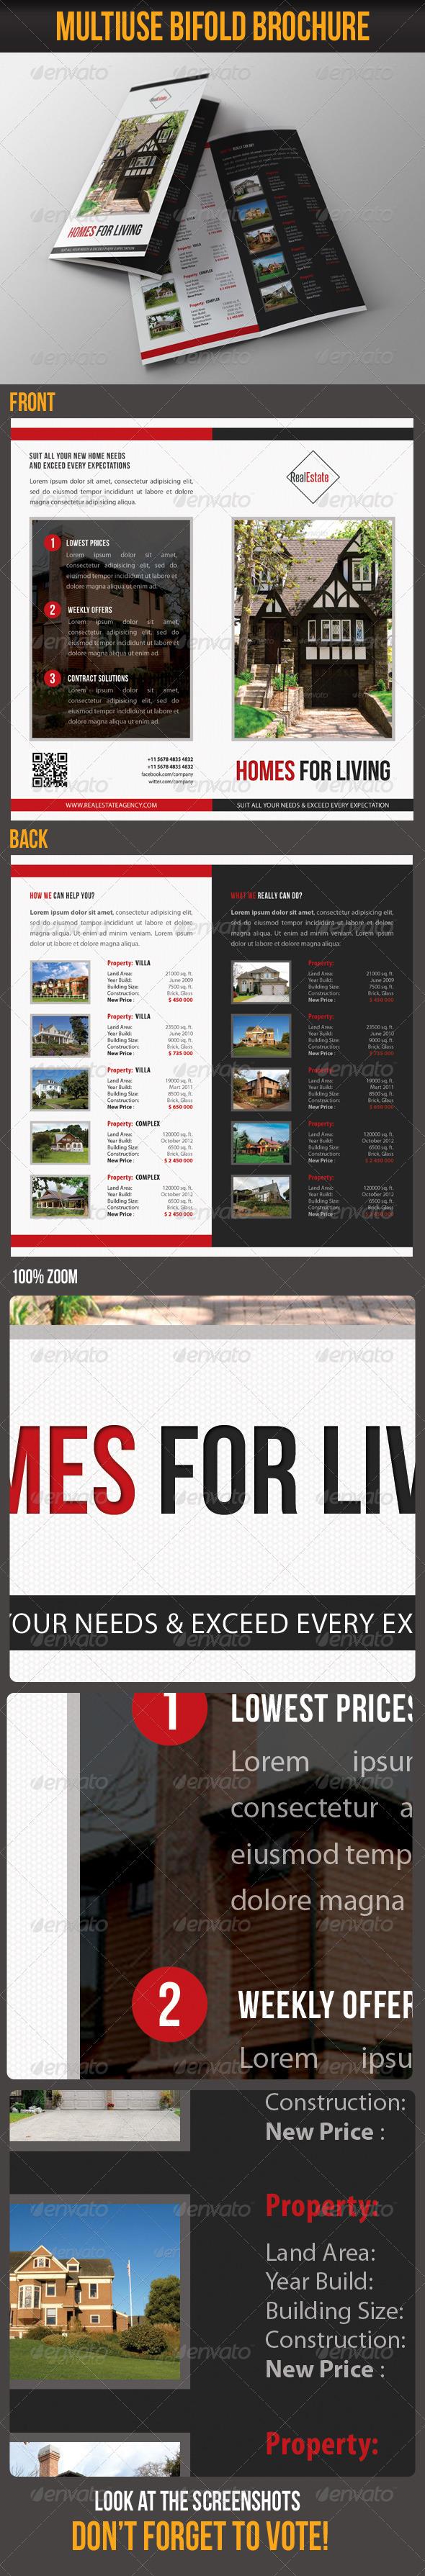 Multiuse Bifold Brochure 58 - Brochures Print Templates